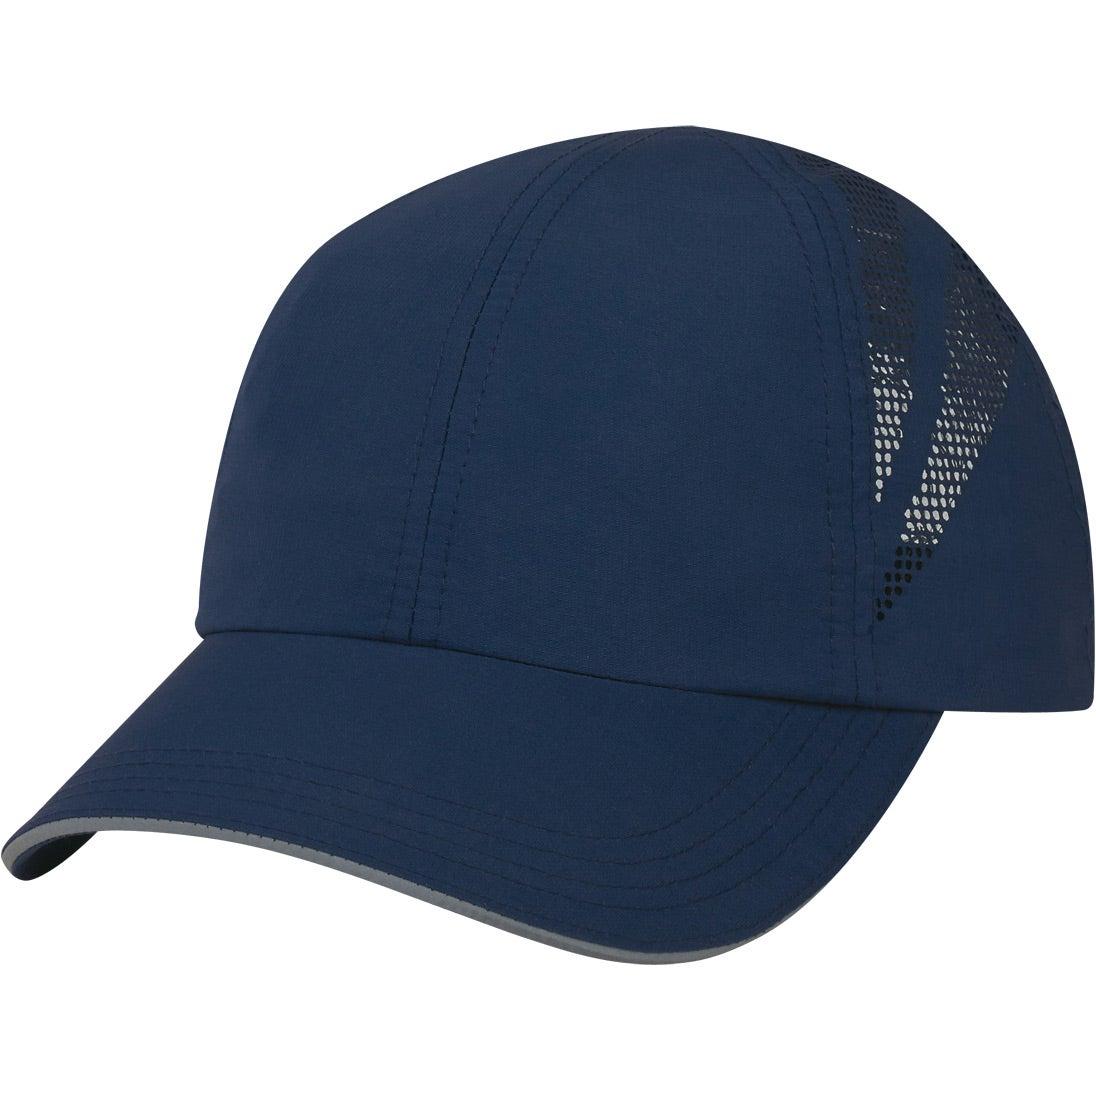 Sports Performance Sandwich Cap Custom Baseball Hats 5